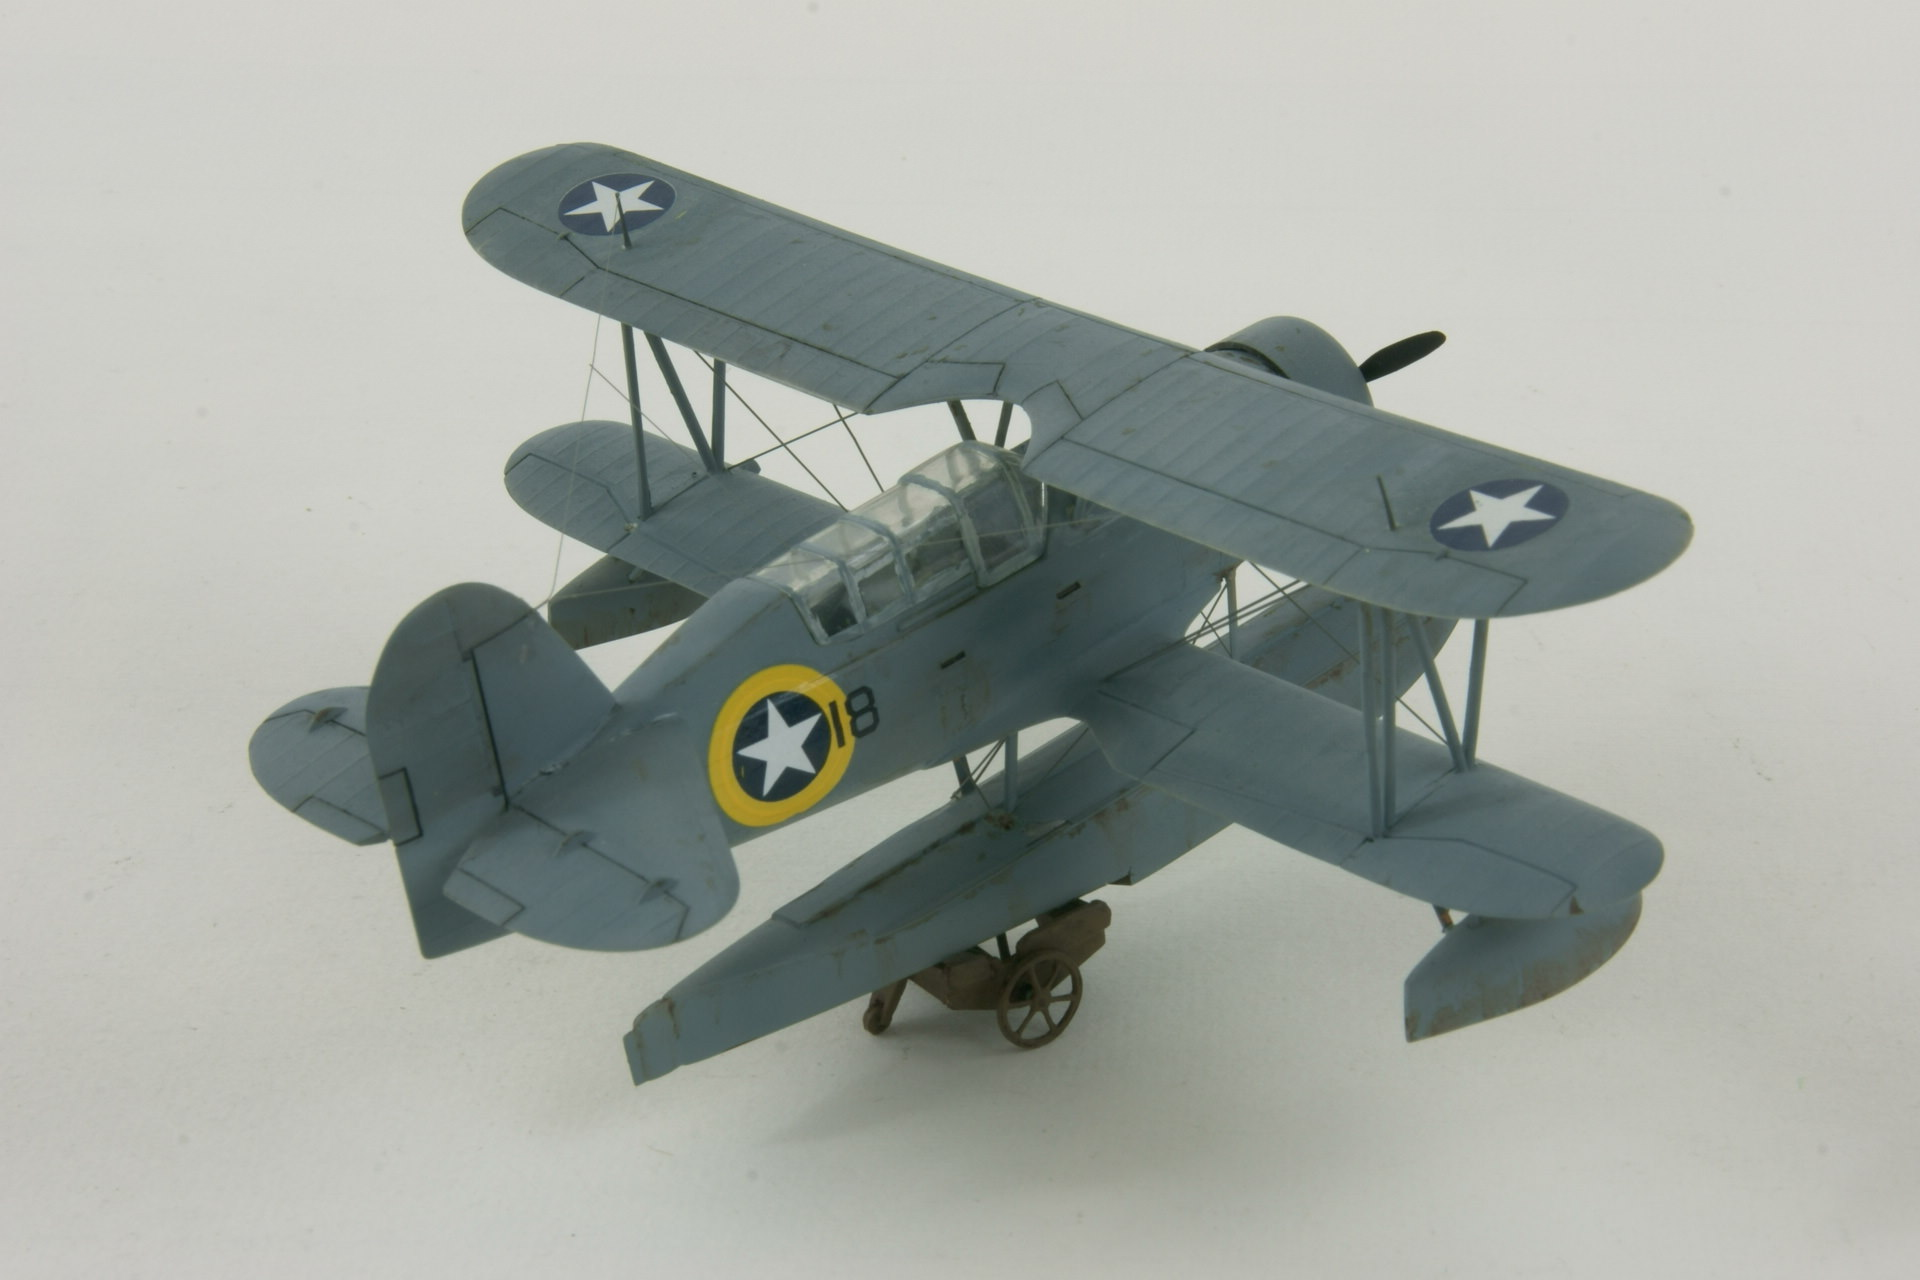 Curtiss soc 2 seagull 3 2